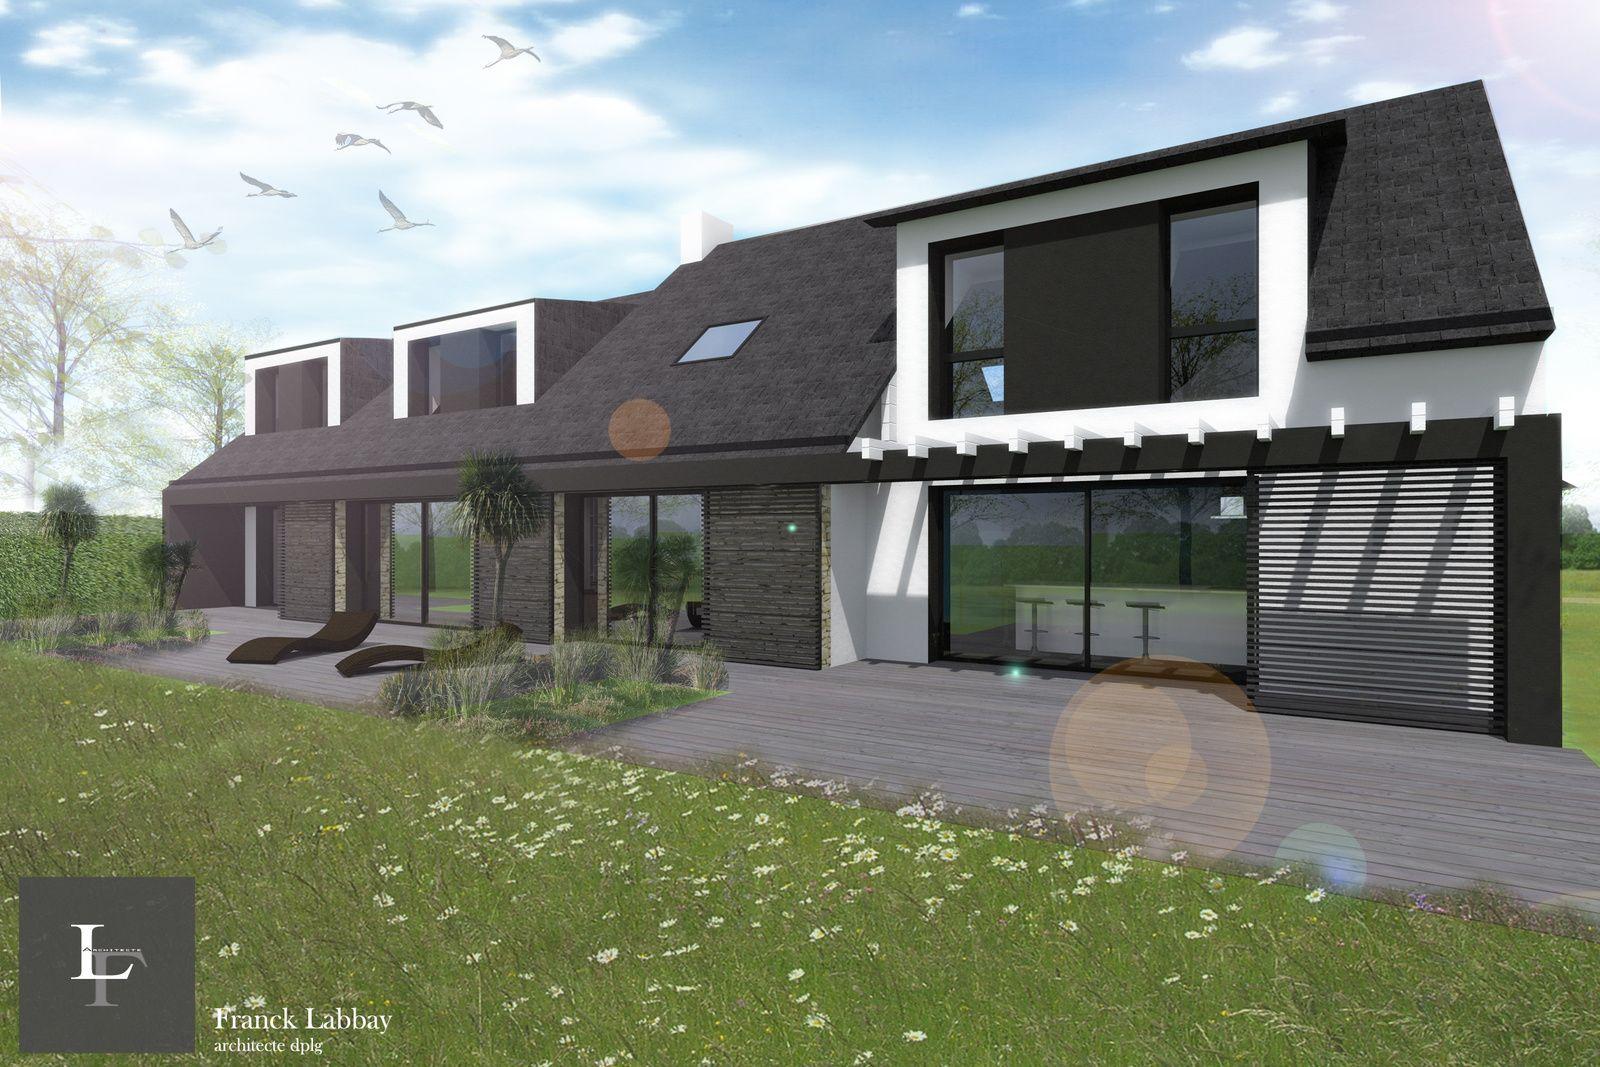 renovation maison neo bretonne 5 maison b extension et renovation dune maison neo toitures. Black Bedroom Furniture Sets. Home Design Ideas